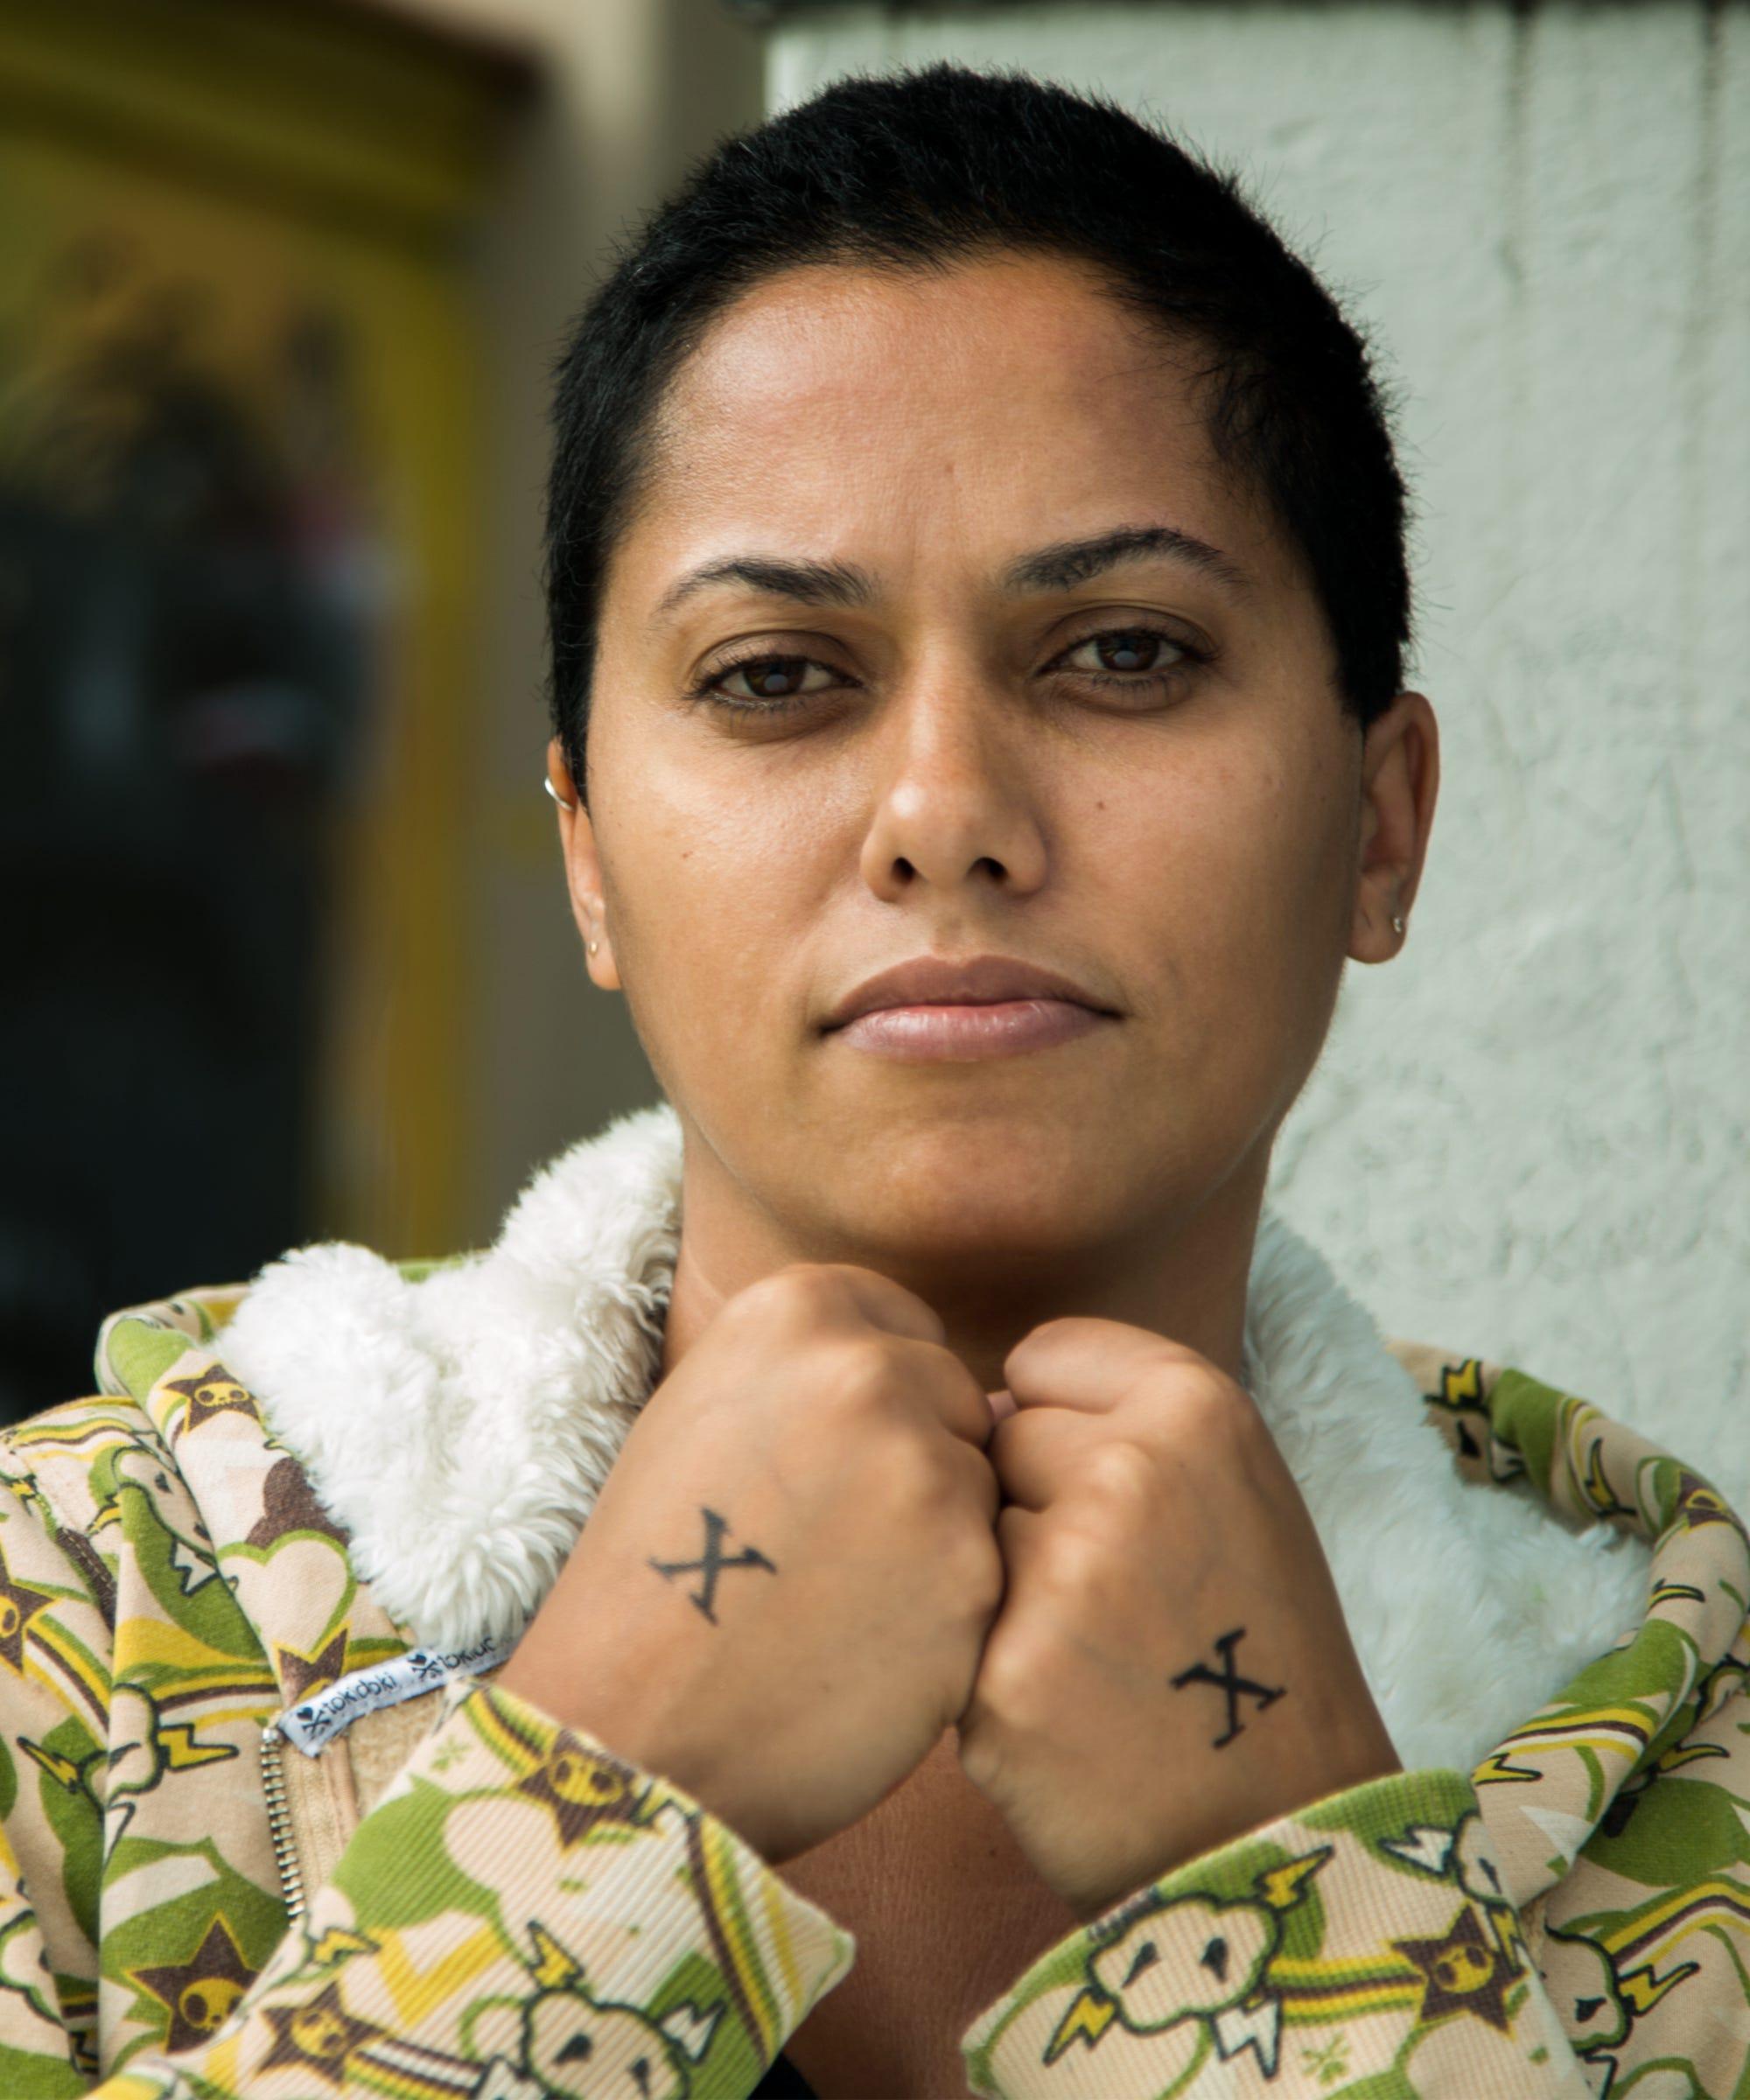 What do brazilian women look like